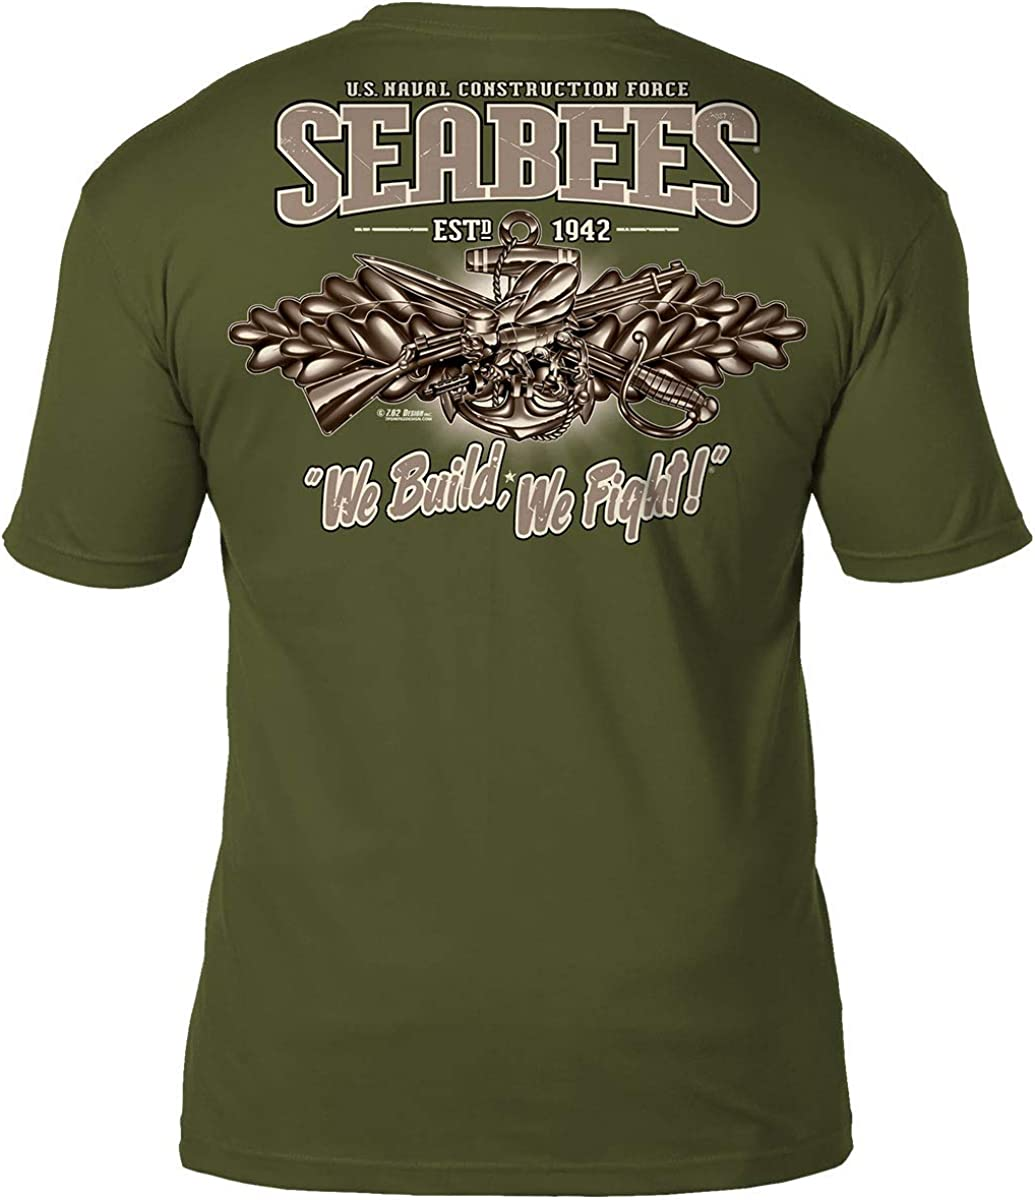 7.62 Design US Navy Seabees 'Vintage' Men's Battlespace T-Shirt